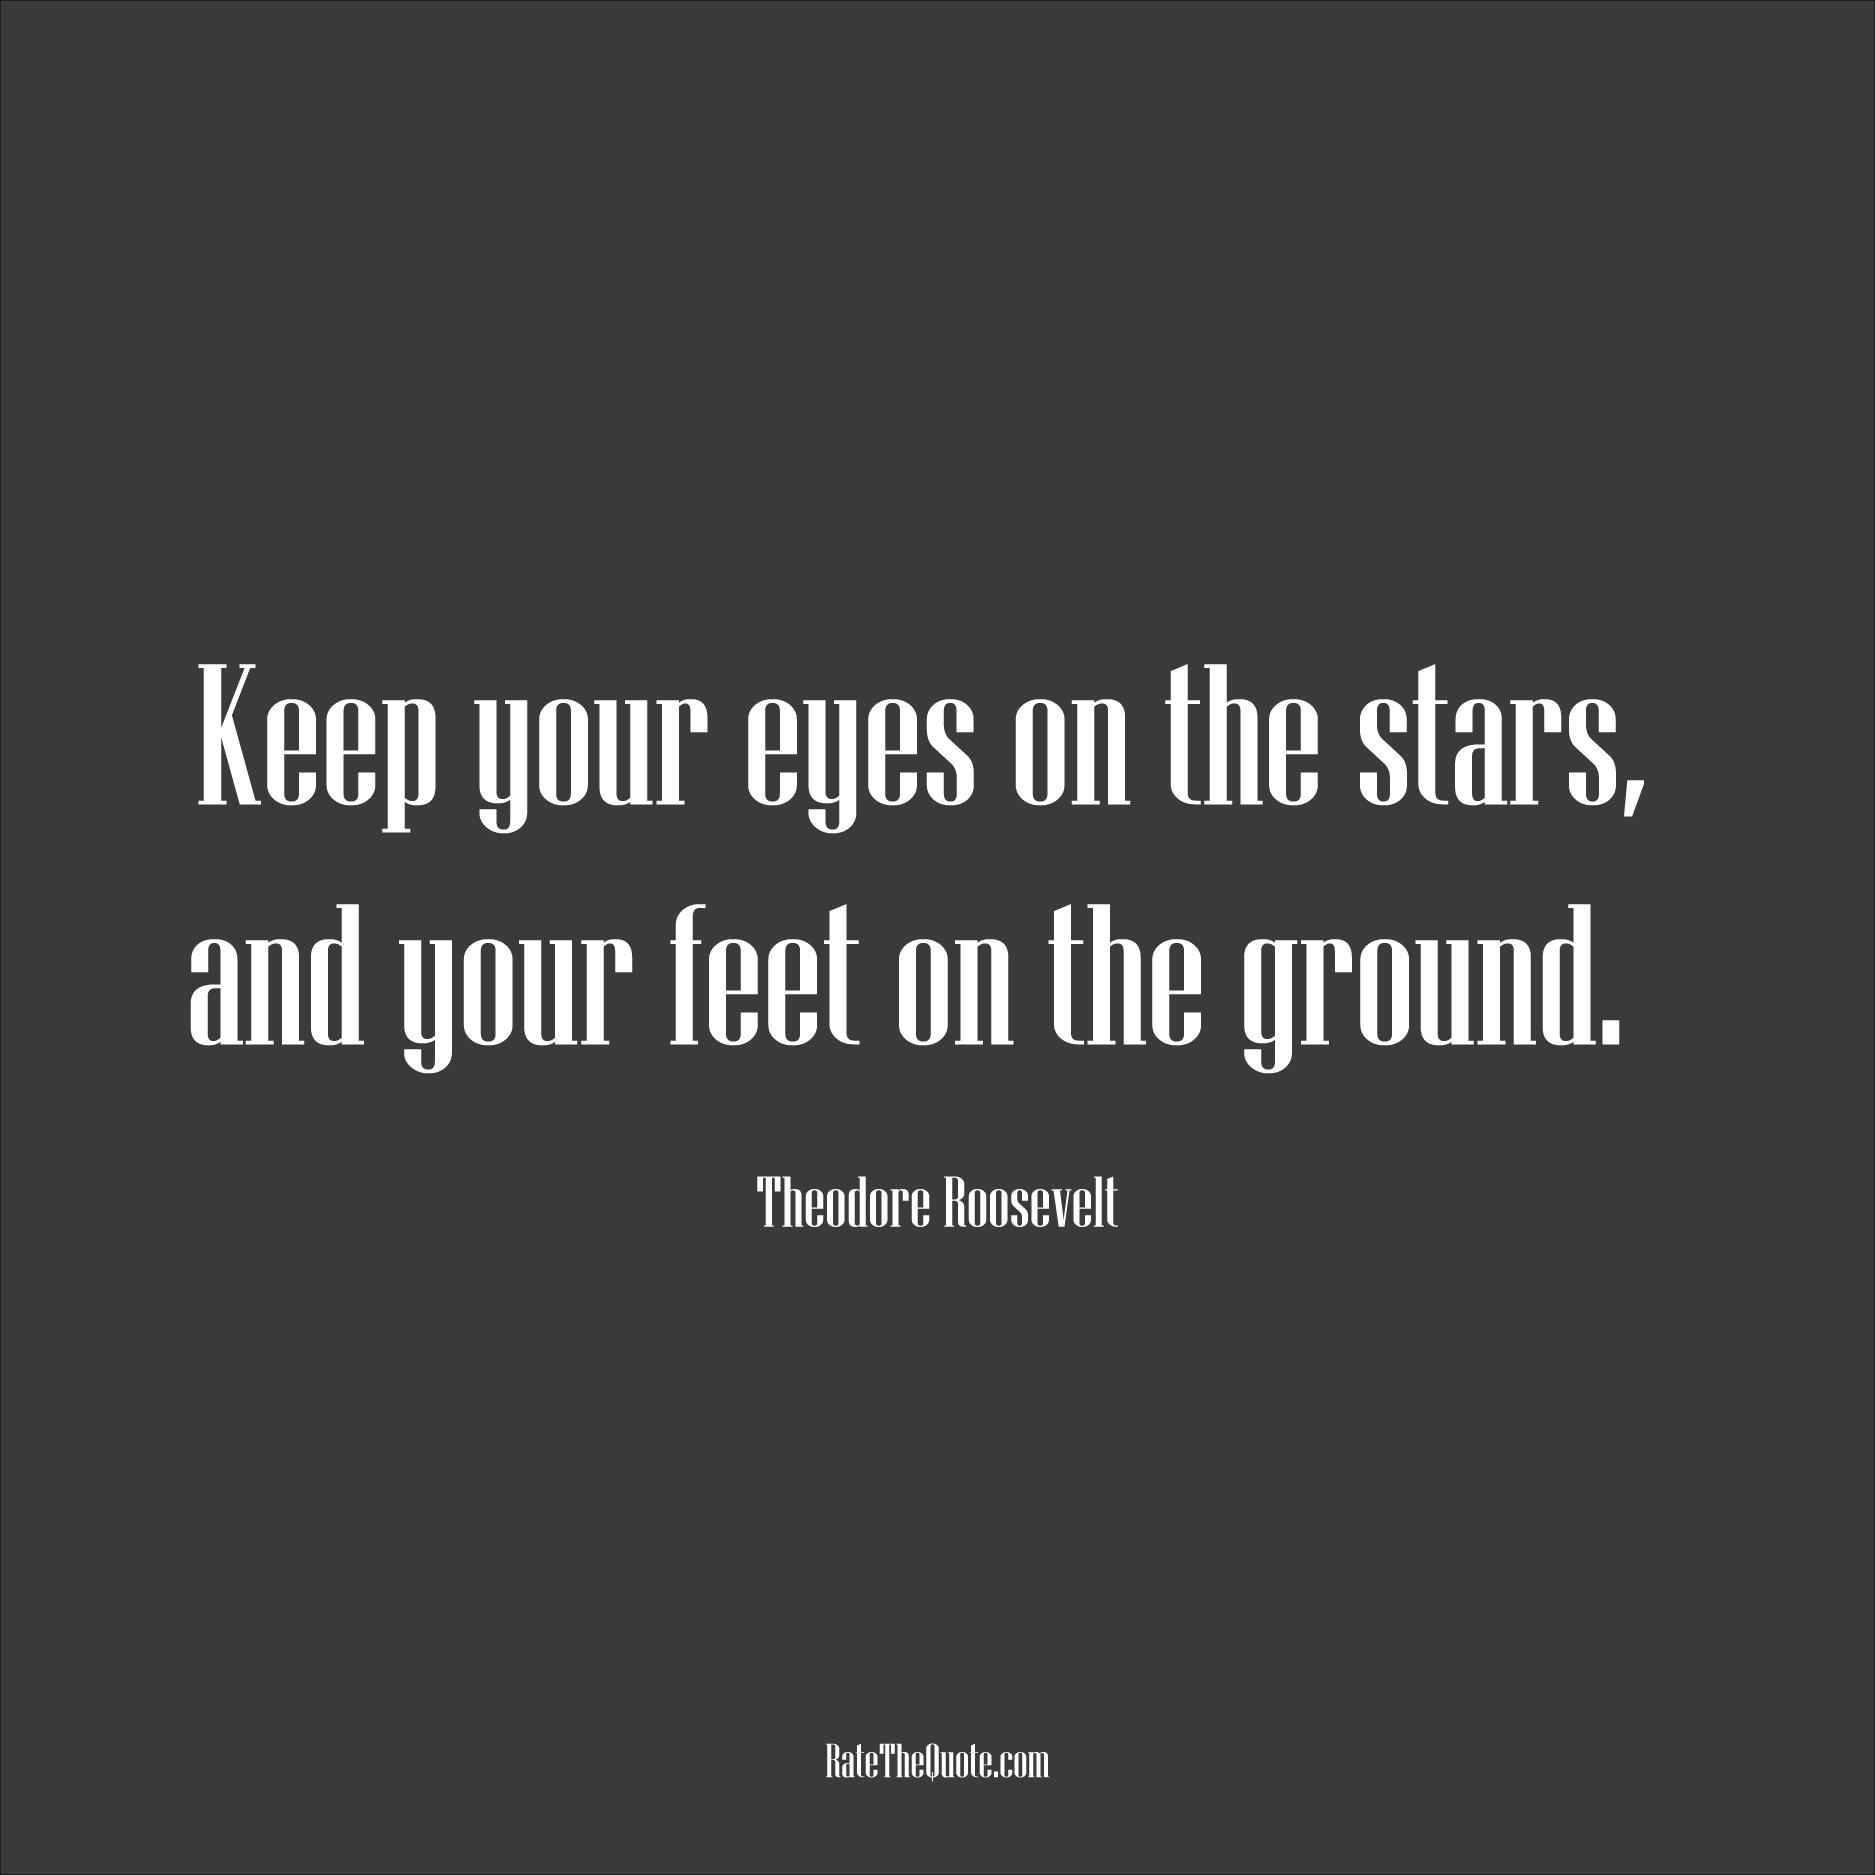 Theodore Roosevelt Quotes Motivational Quotes  Ratethequote